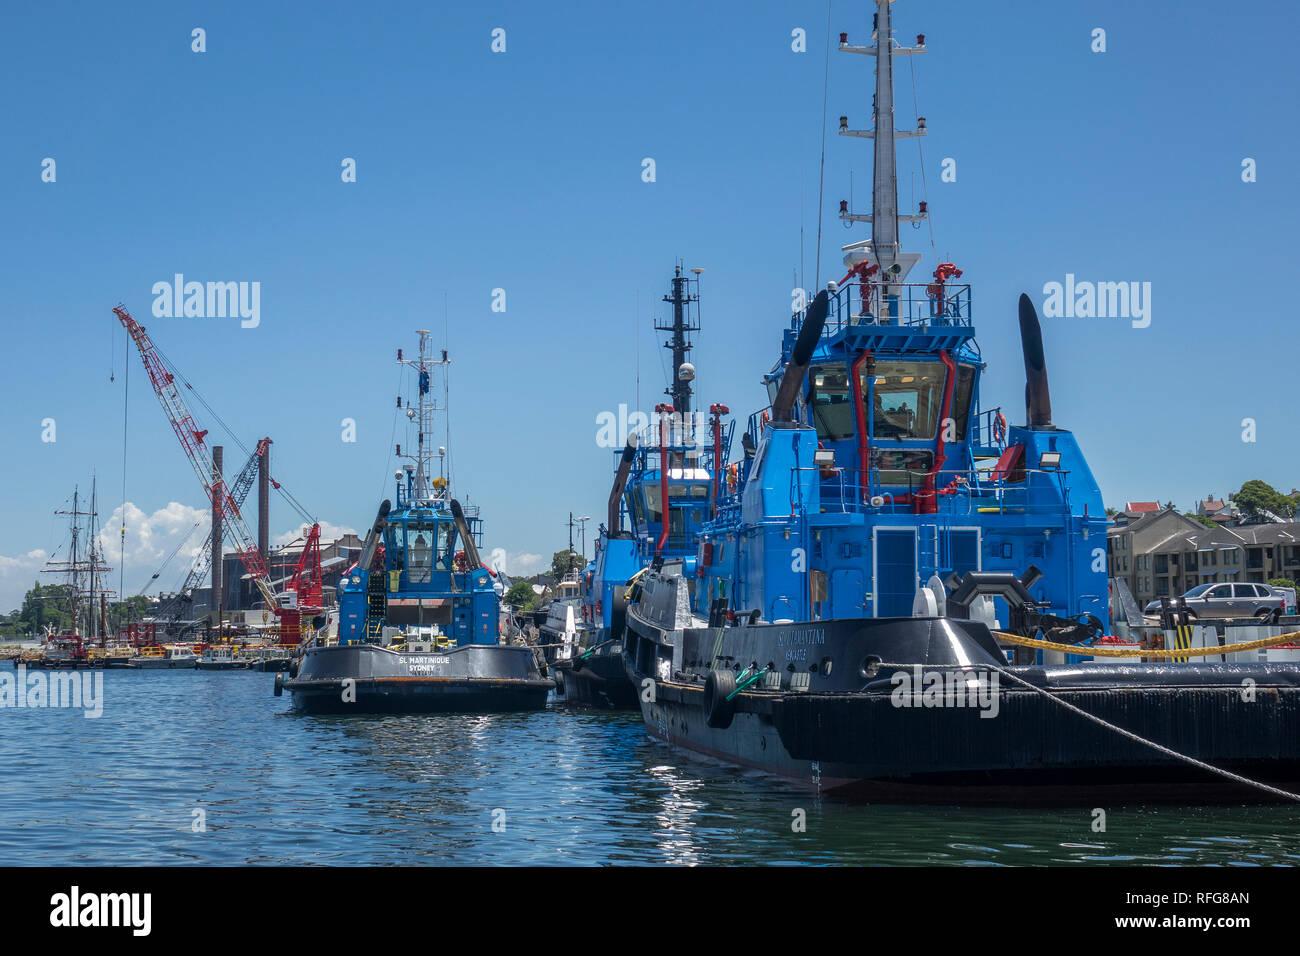 Australia, New South Wales, Sydney, tugs in White Bay docks - Stock Image